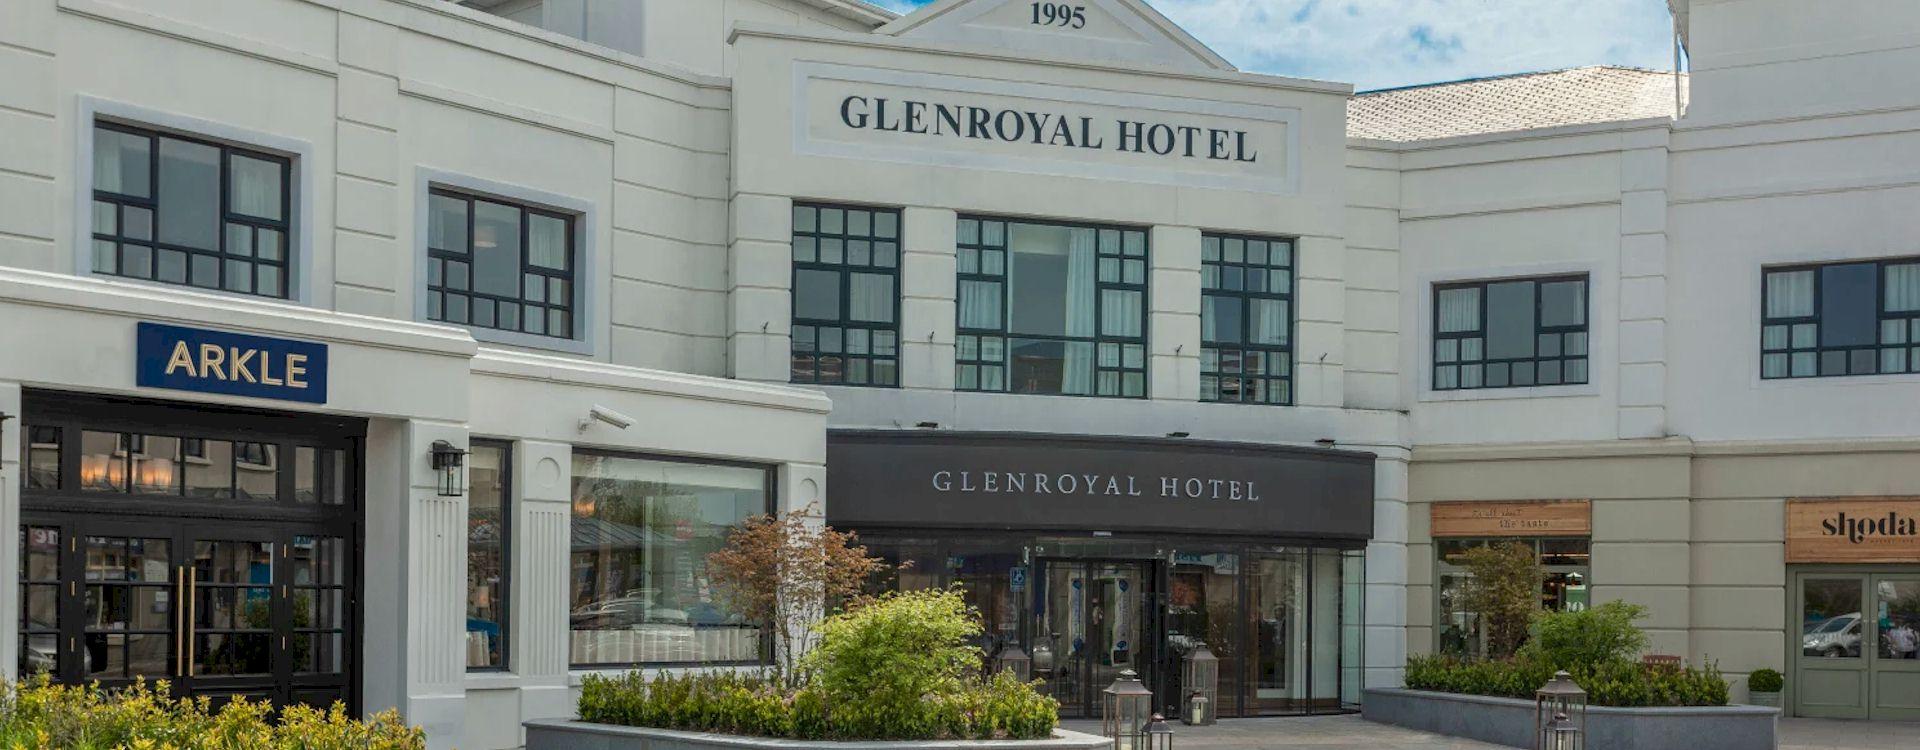 Glenroyal Hotel Fairyhouse Winter Festival Packages